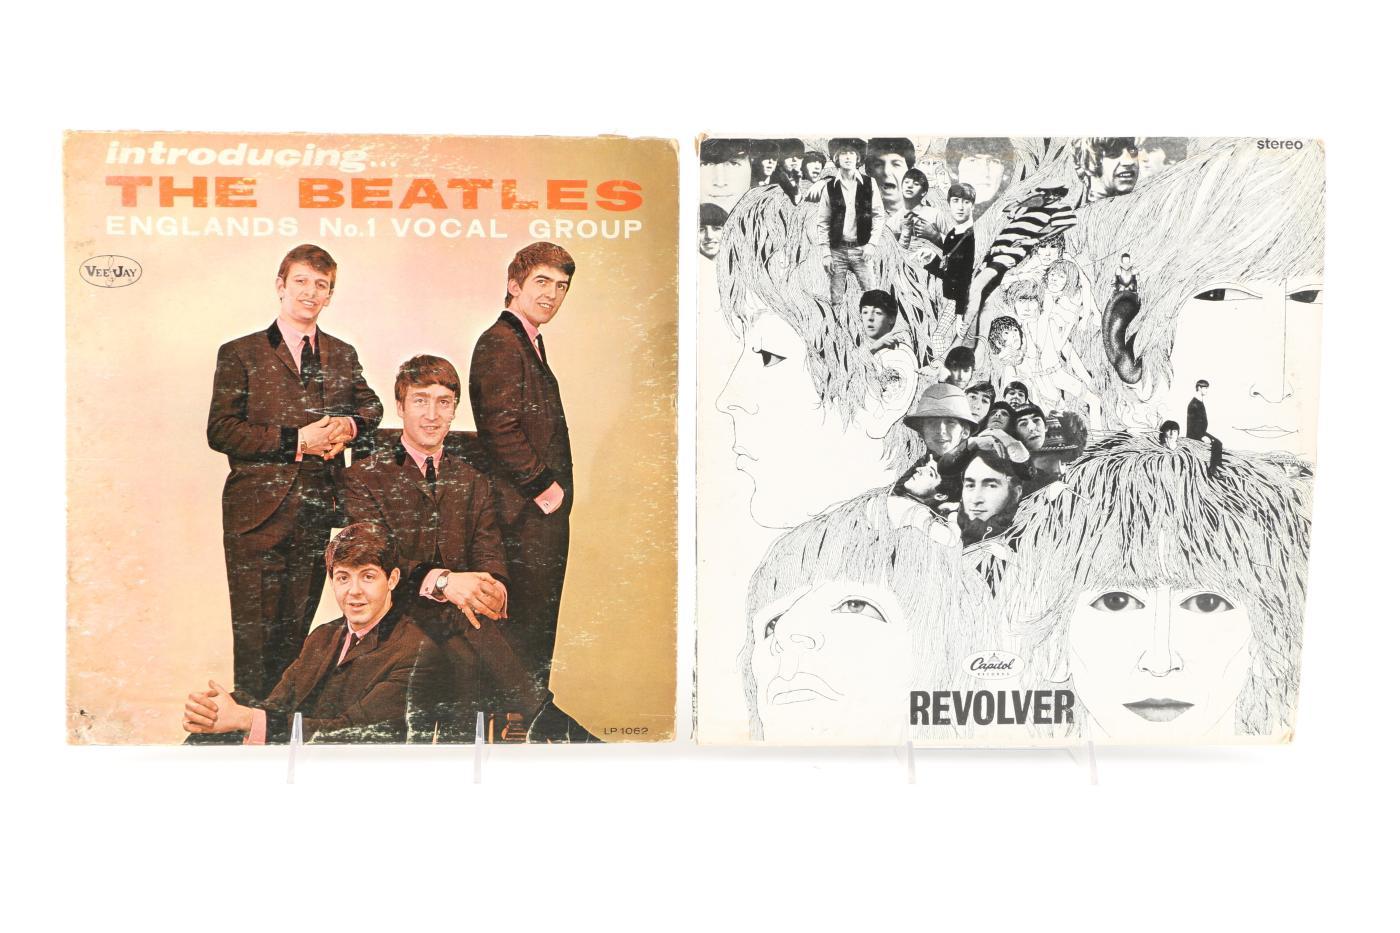 Beatles Doors Monkees And Other Vintage Lps Ebth